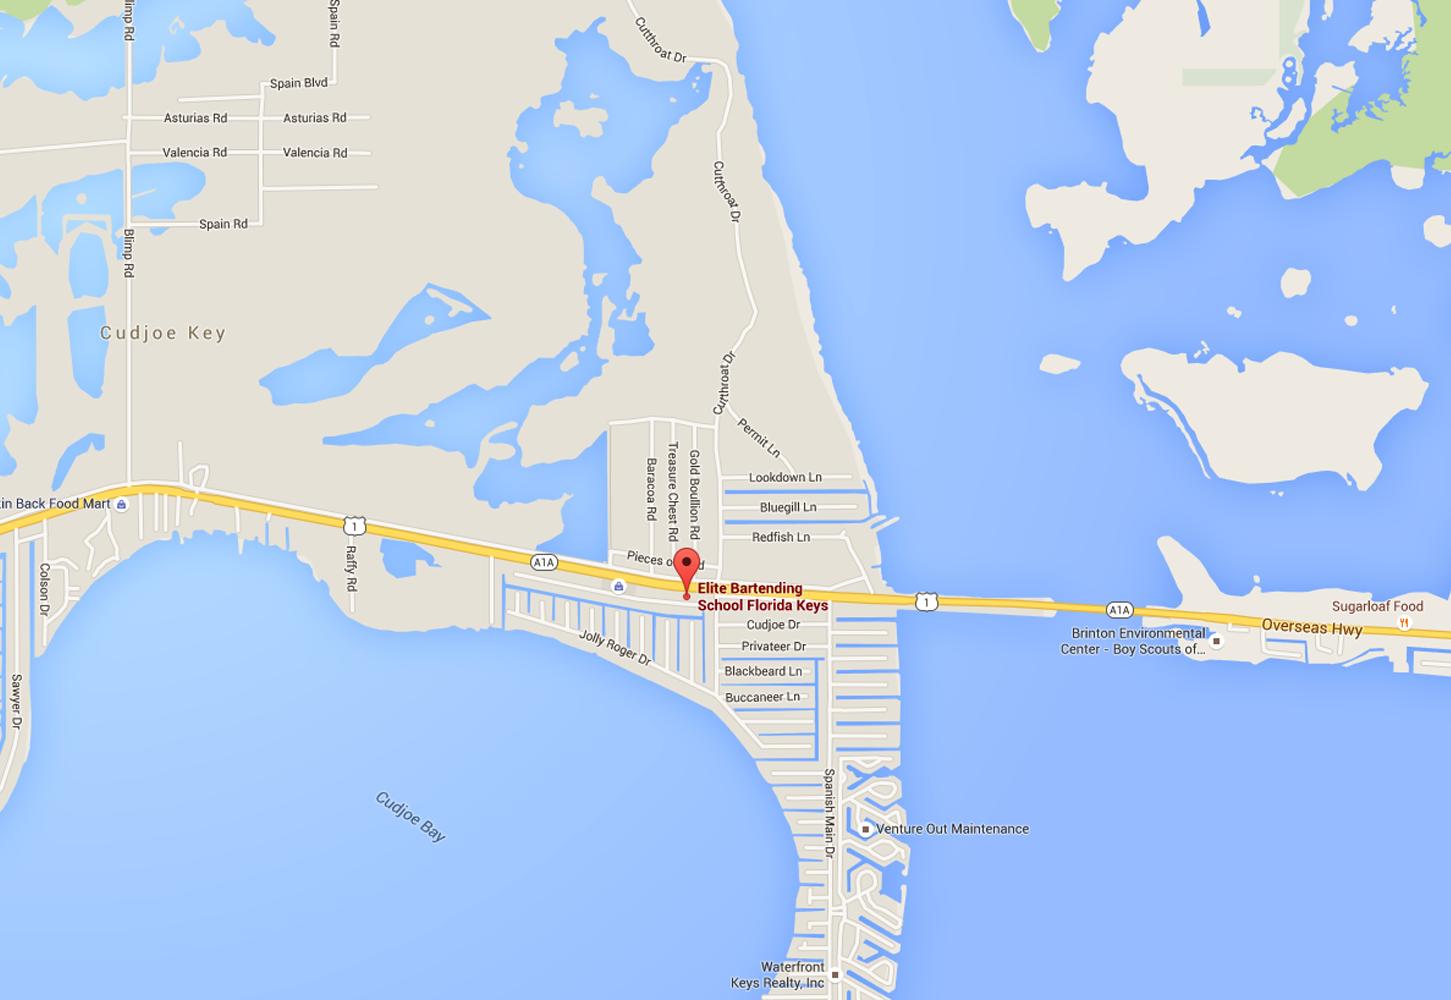 Contact Us Elite Bartending School Of The Florida Keys - Florida keys us map